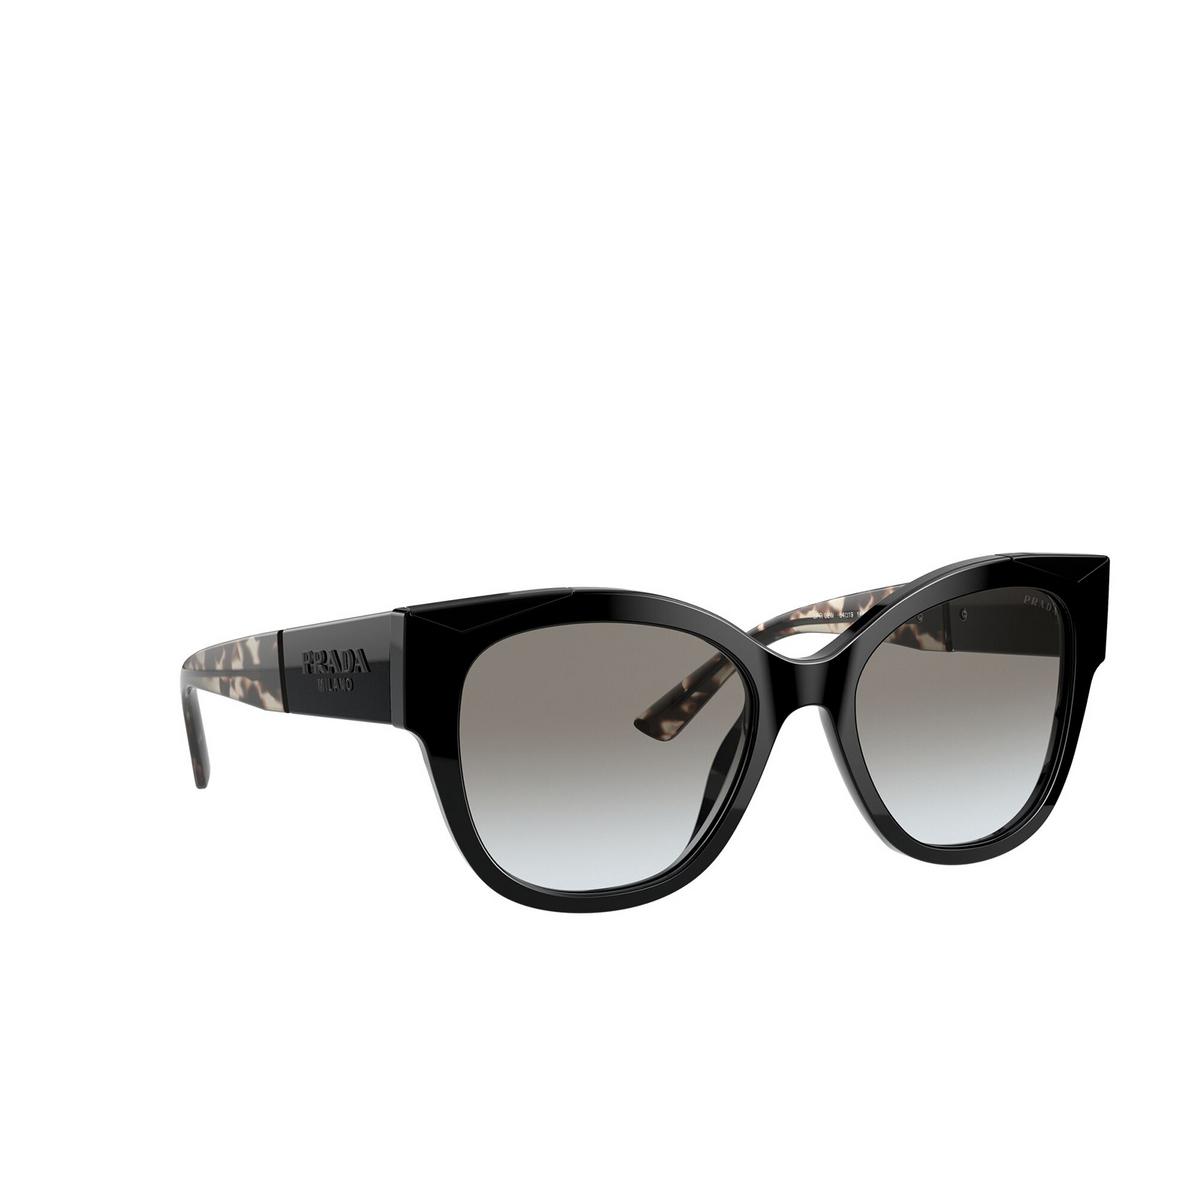 Prada® Butterfly Sunglasses: PR 02WS color Black 1AB0A7 - three-quarters view.